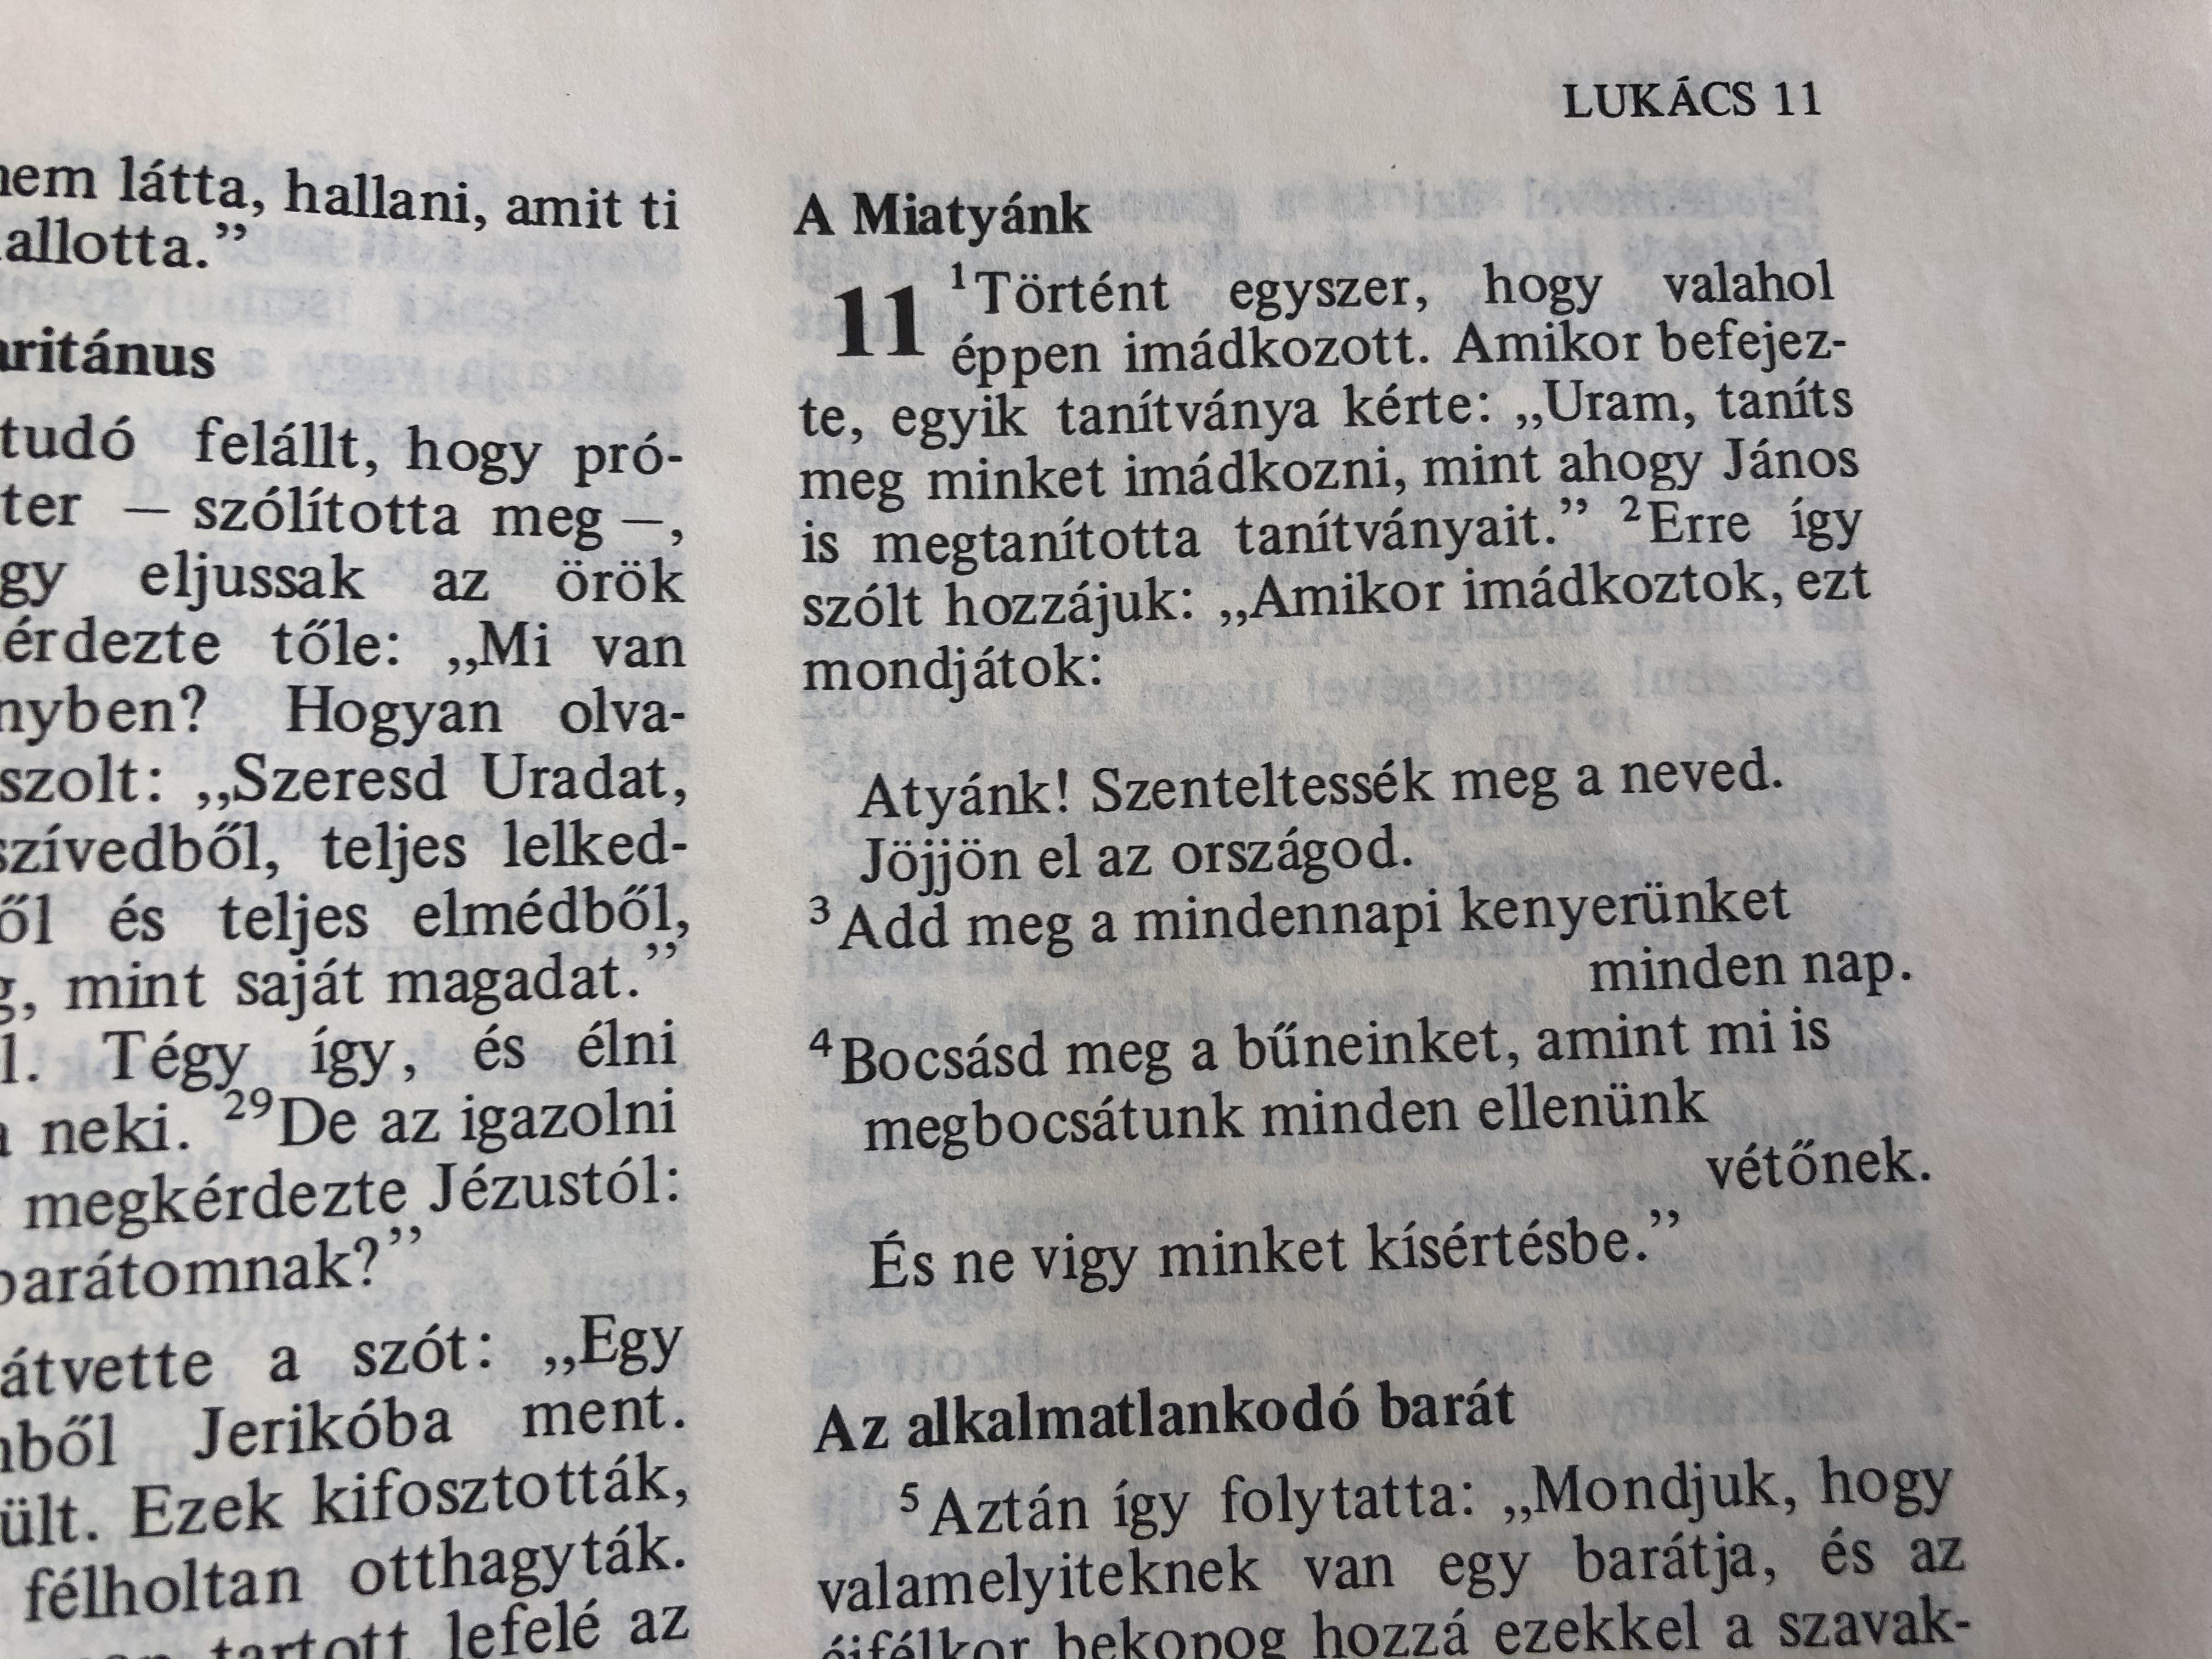 biblia-hungarian-catholic-family-bible-sz-vets-gi-s-jsz-vets-gi-szent-r-s-szent-istv-n-t-rsulat-5th-edition-5.-kiad-s-red-hardcover-14-.jpg